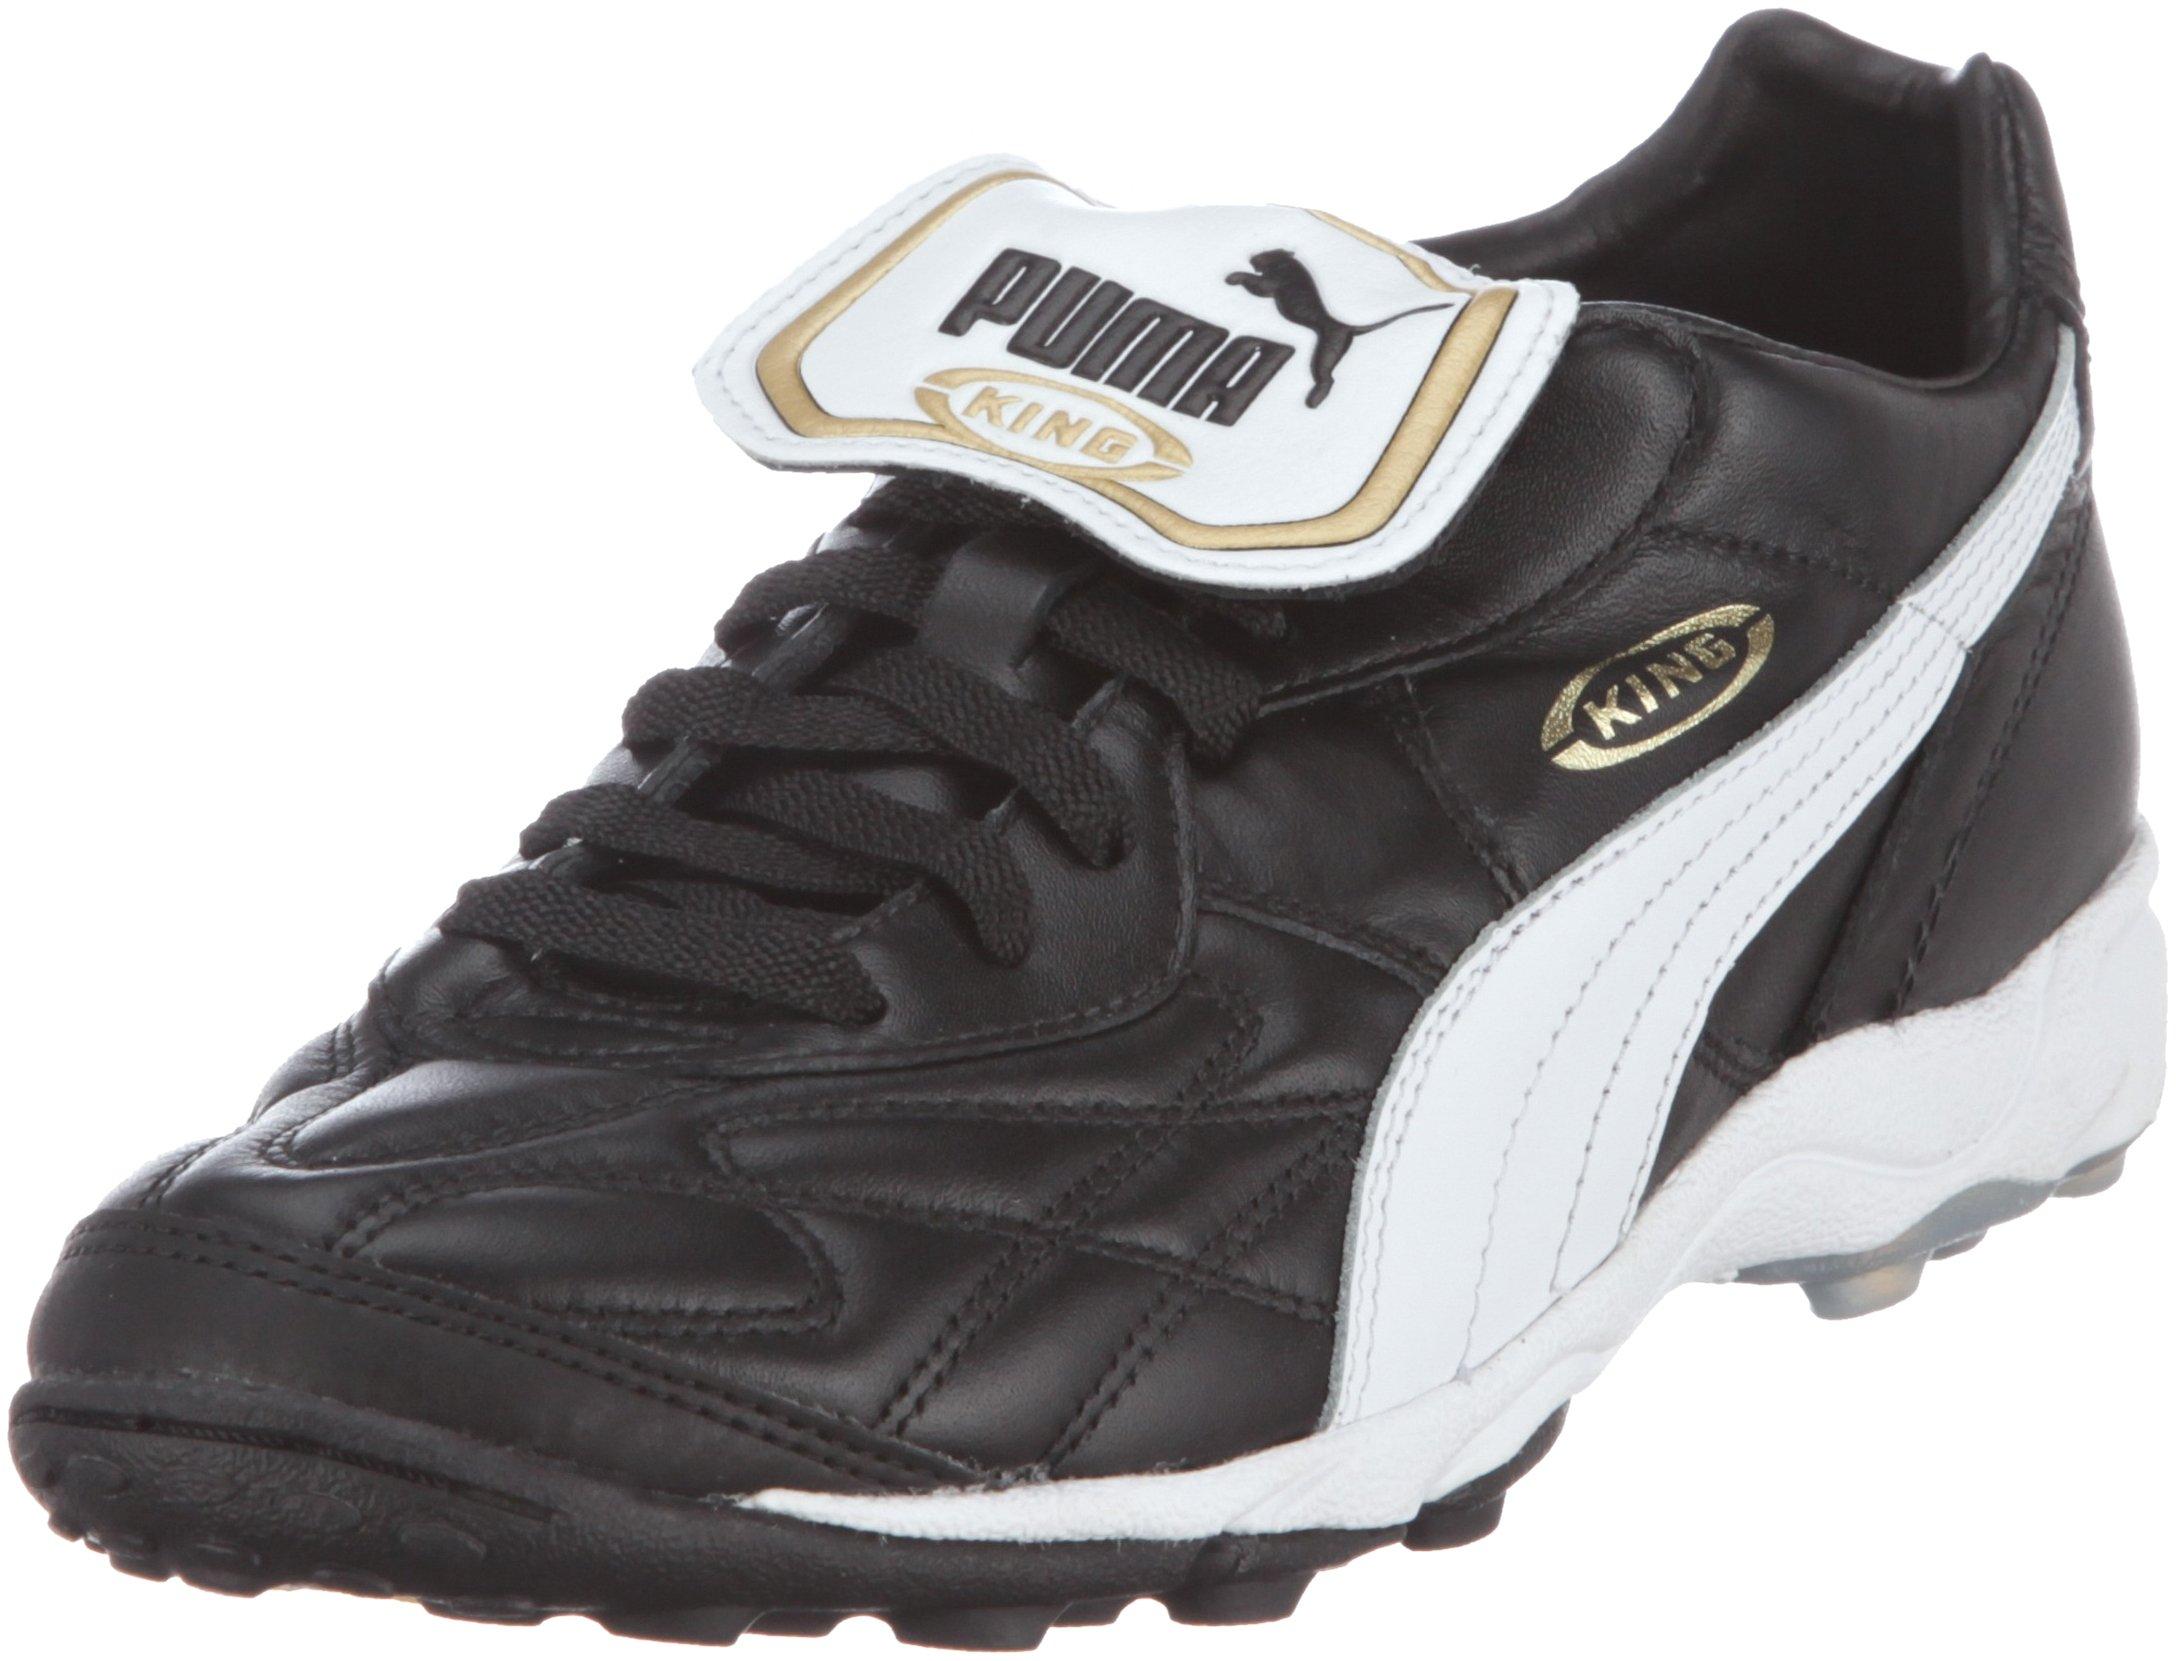 Men's King Allround Tt Football Shoes - Buy Online in Cambodia